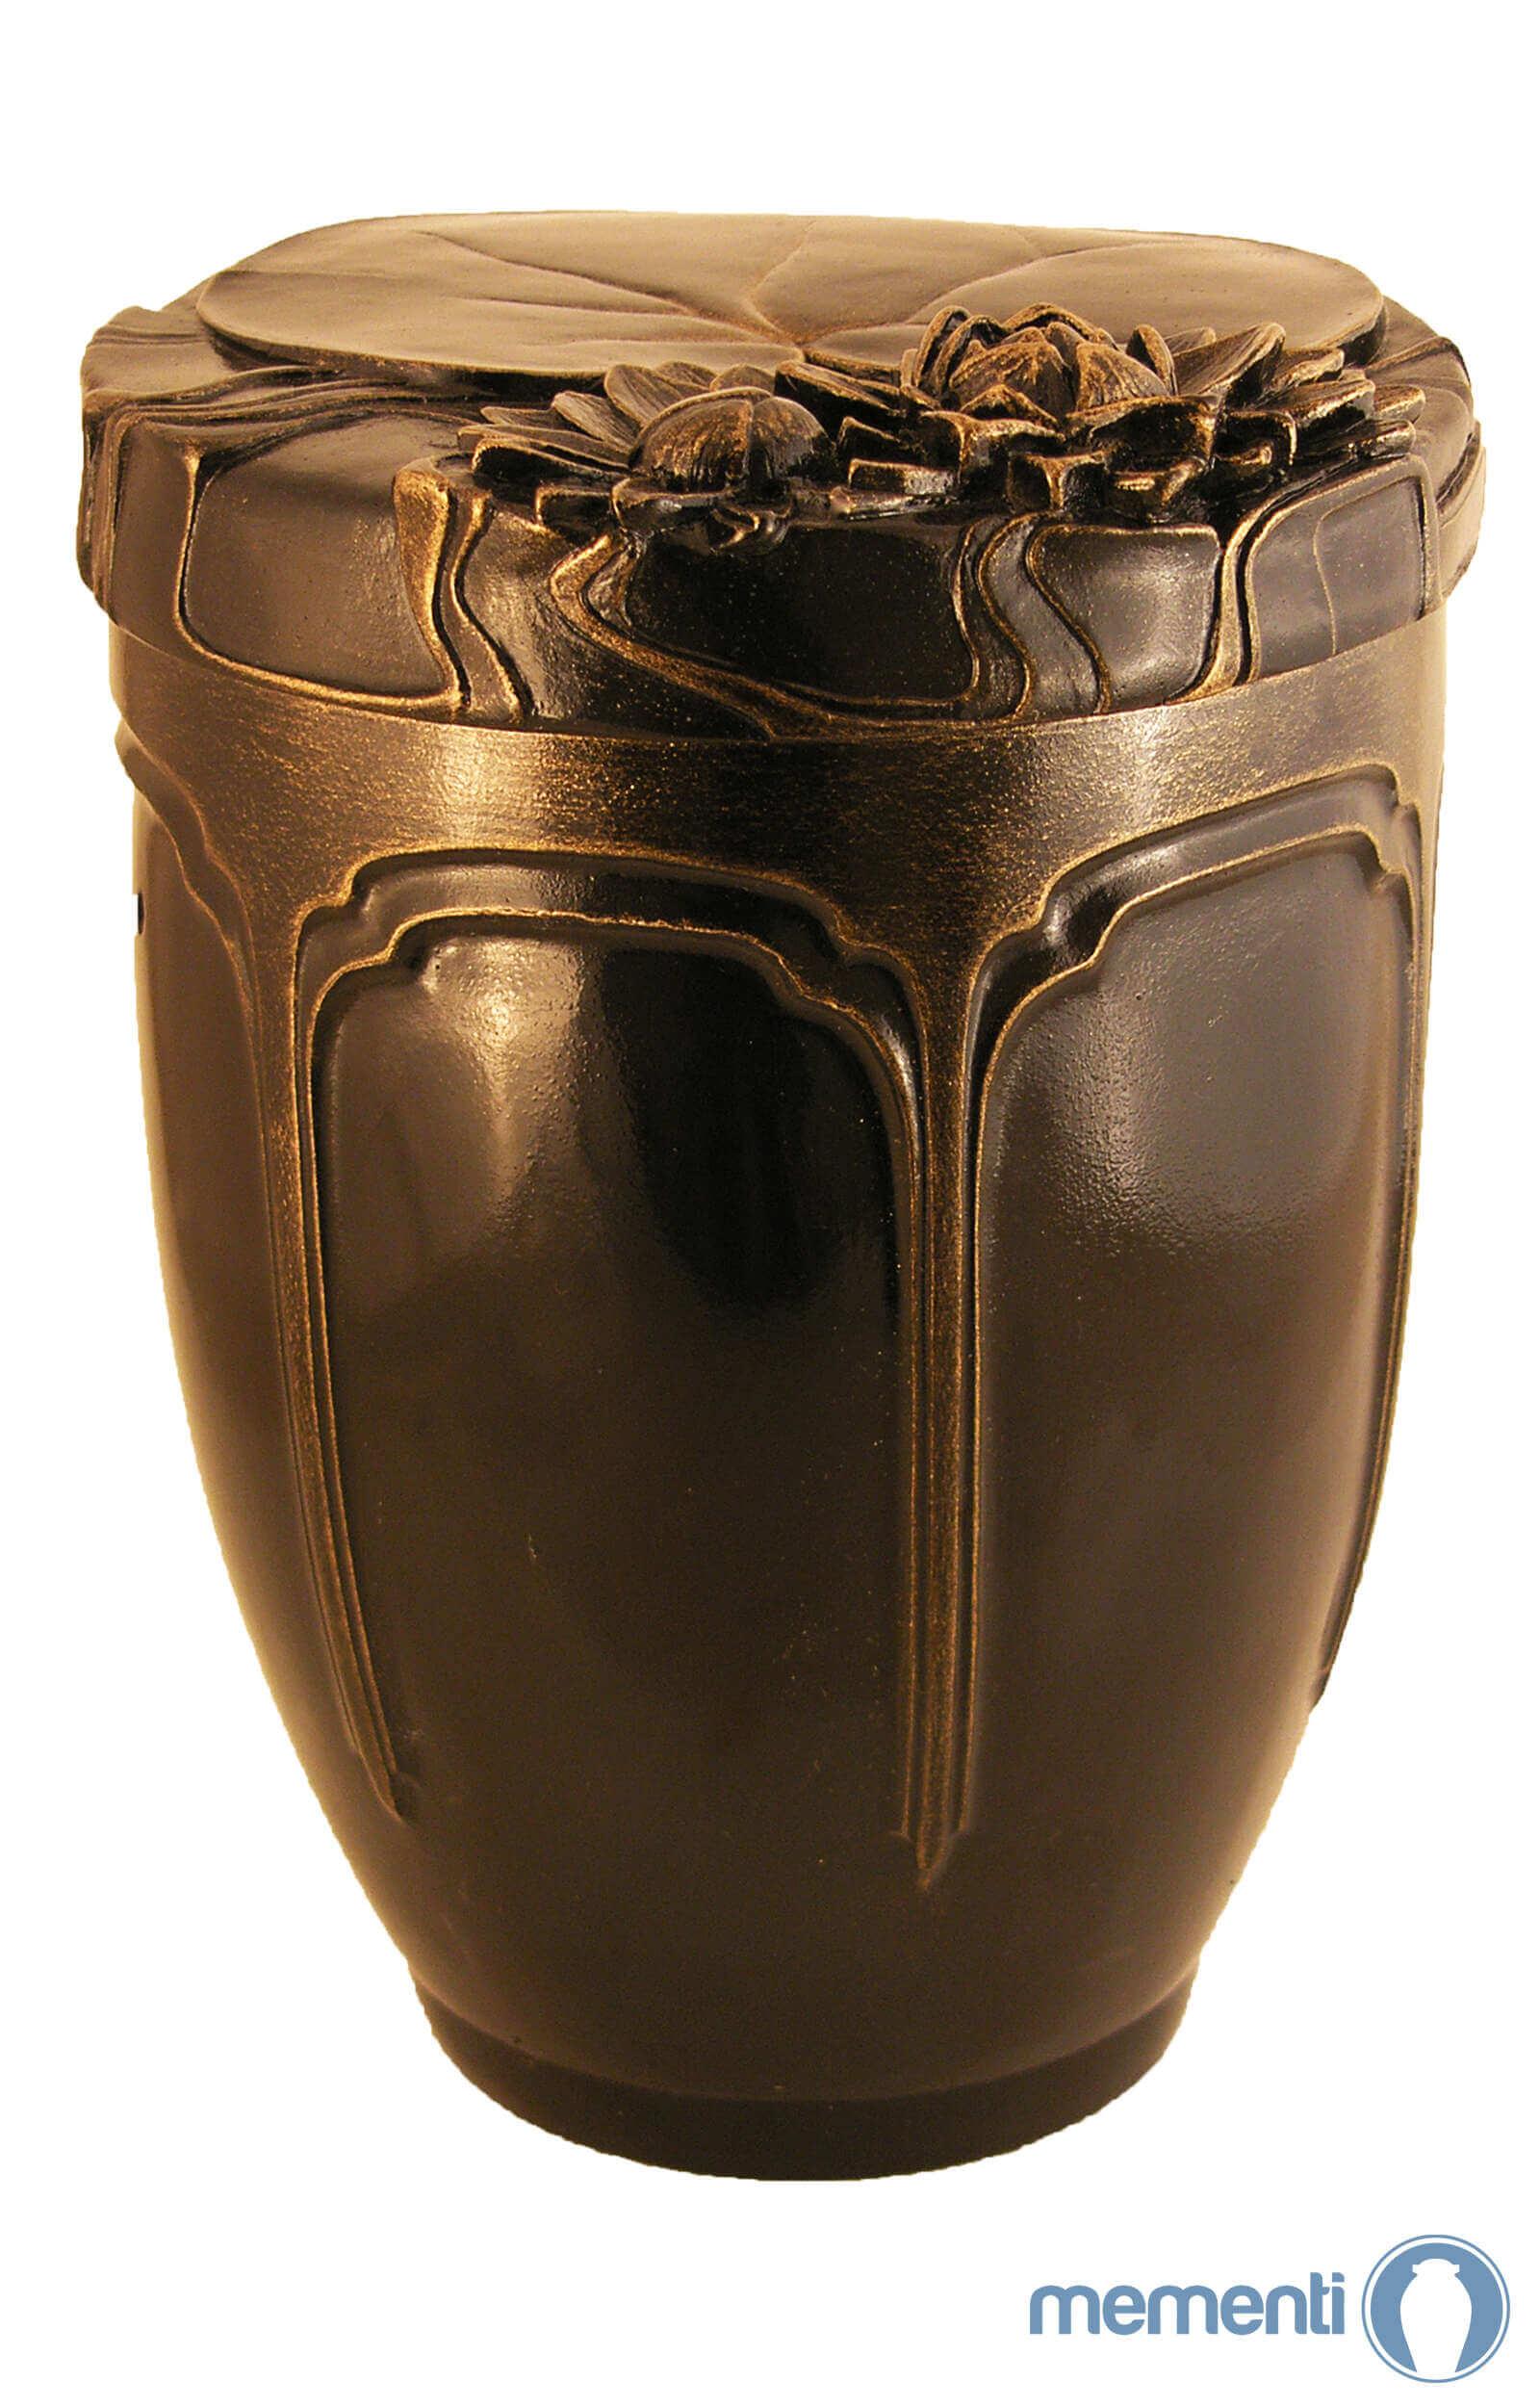 de KB1578 keramik urne kaufen keramikurne seerose